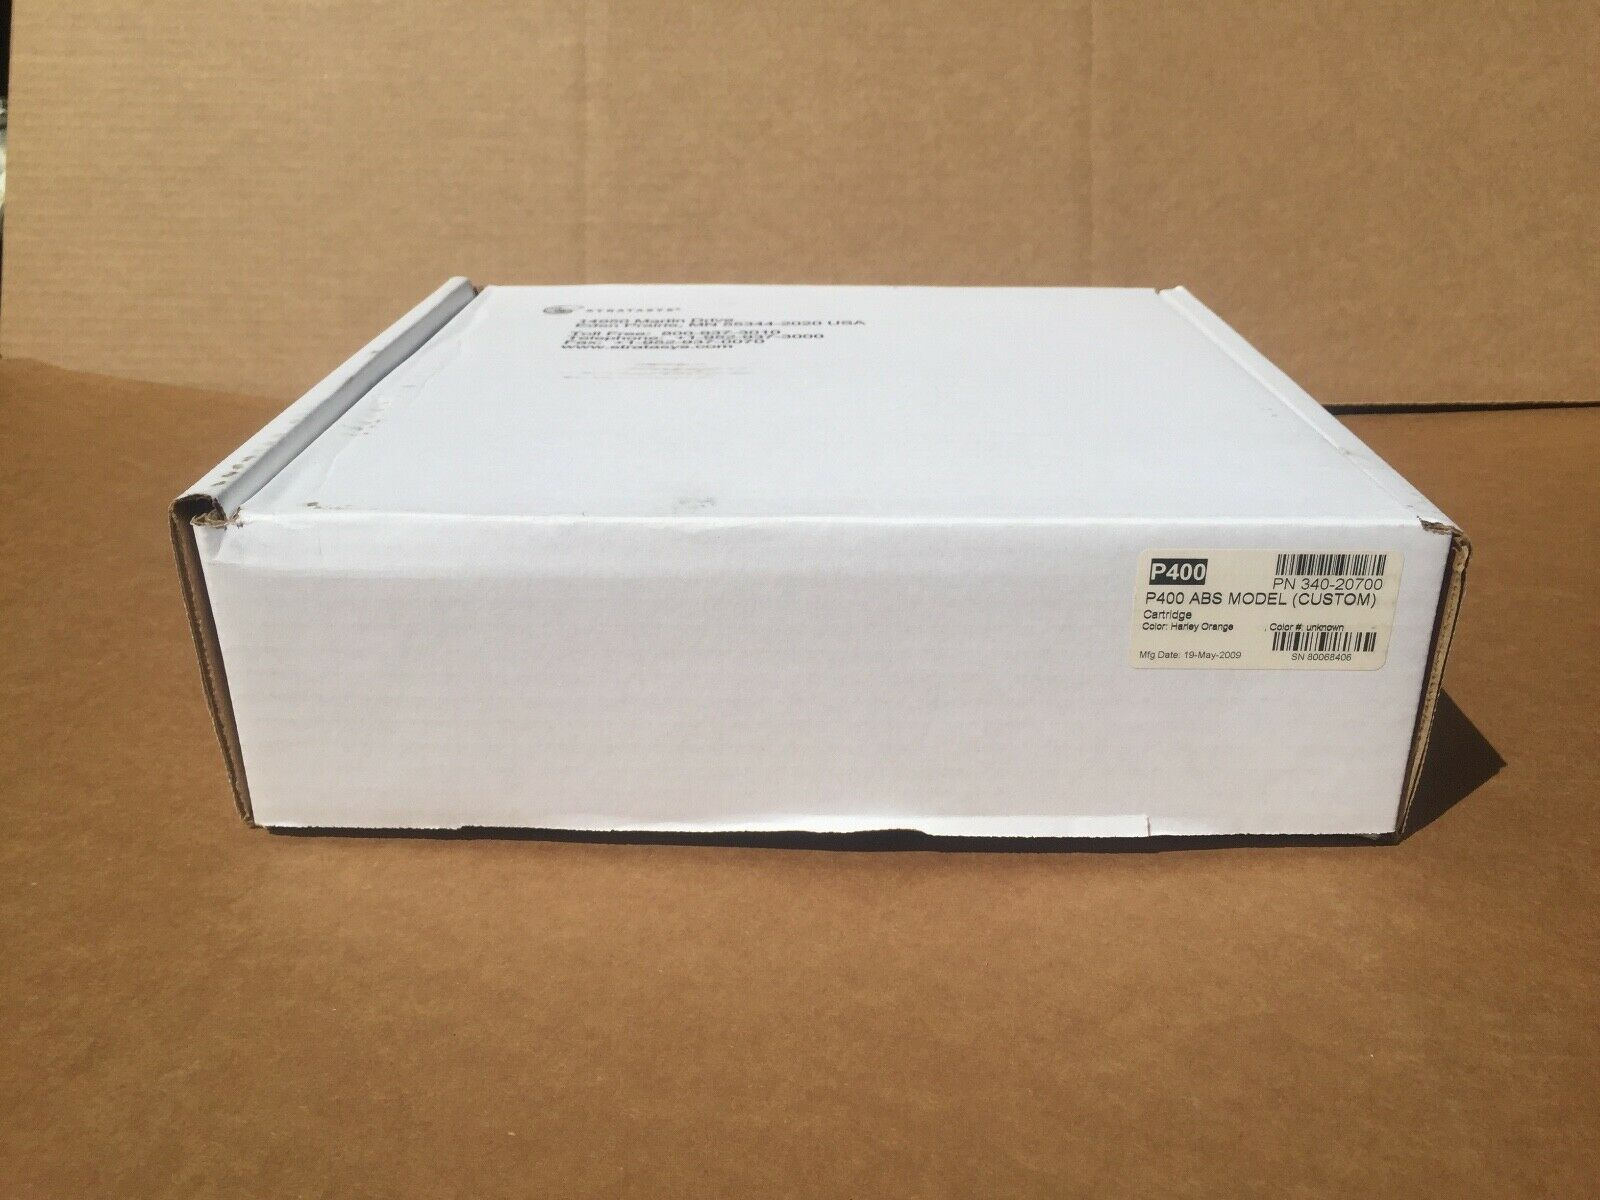 HARLEY DAVIDSON ORANGE 3D PRINTER FILAMENT STRATASYS P400 CARTRIDGE 340-20700